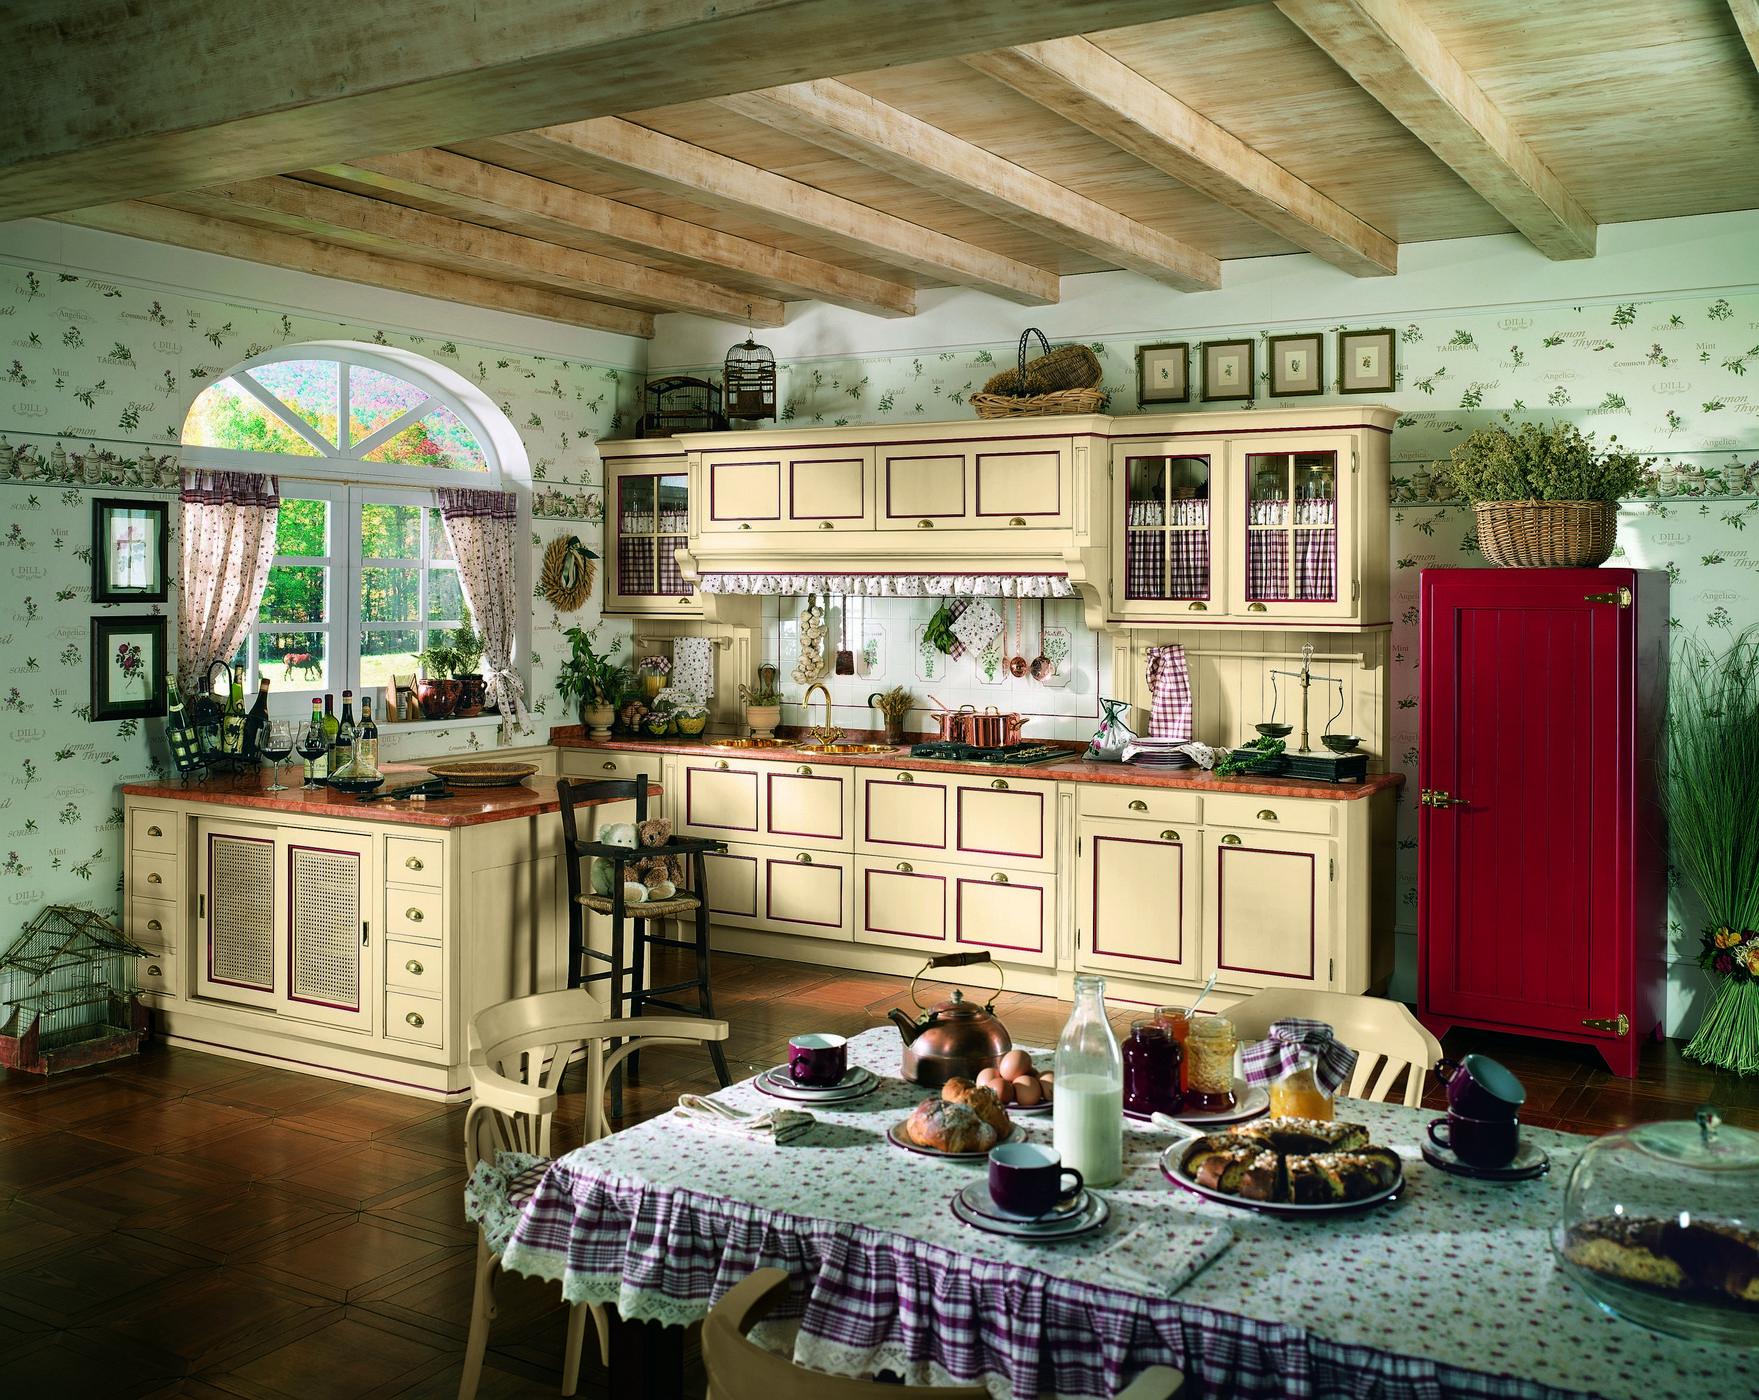 Cucina Cotton by L\'Ottocento Srl | Media - Slideshow - 1 ...